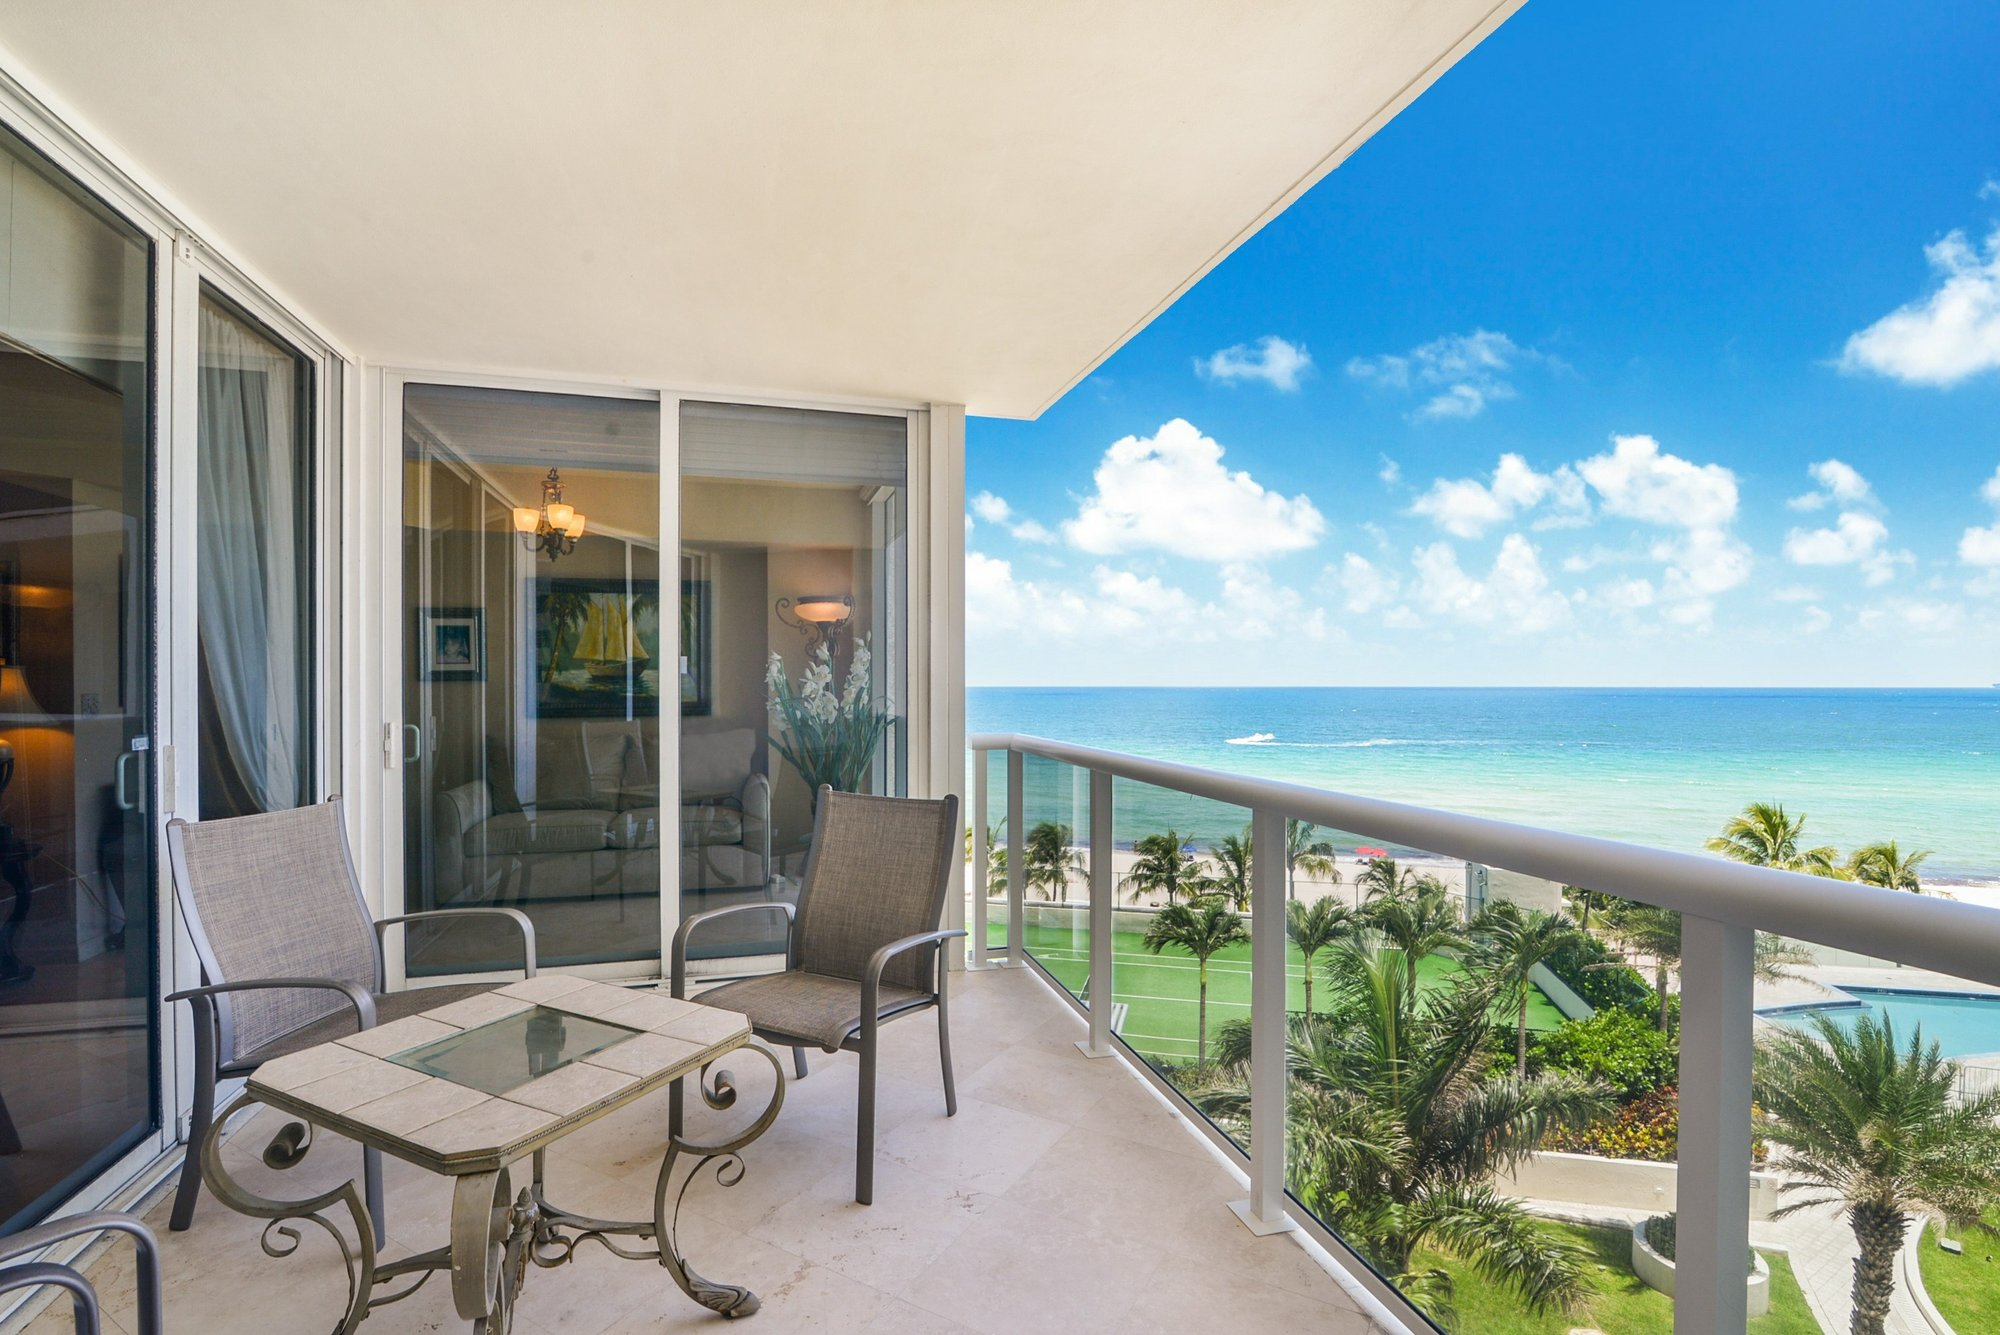 Condo in Golden Beach, Florida, United States 1 - 11556069